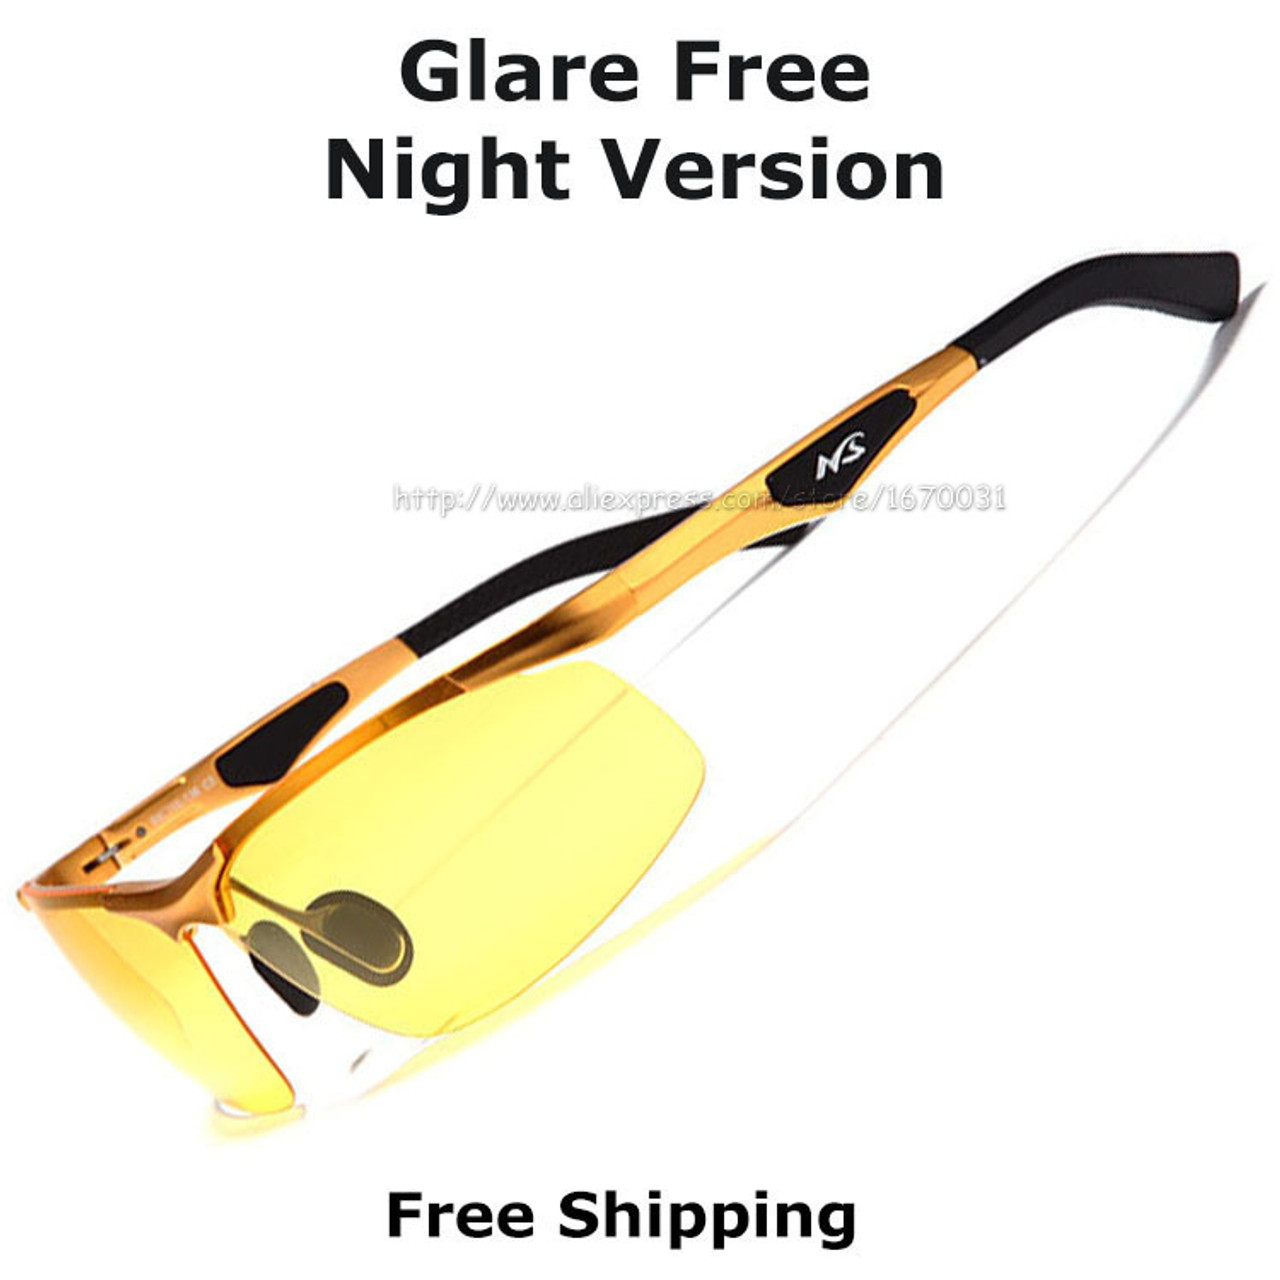 a612fa07c8 ... New AORON 2017 Anti-Glare Goggles Eyeglasses Polarized Driving  Sunglasses Yellow Lens Night Vision Driving ...